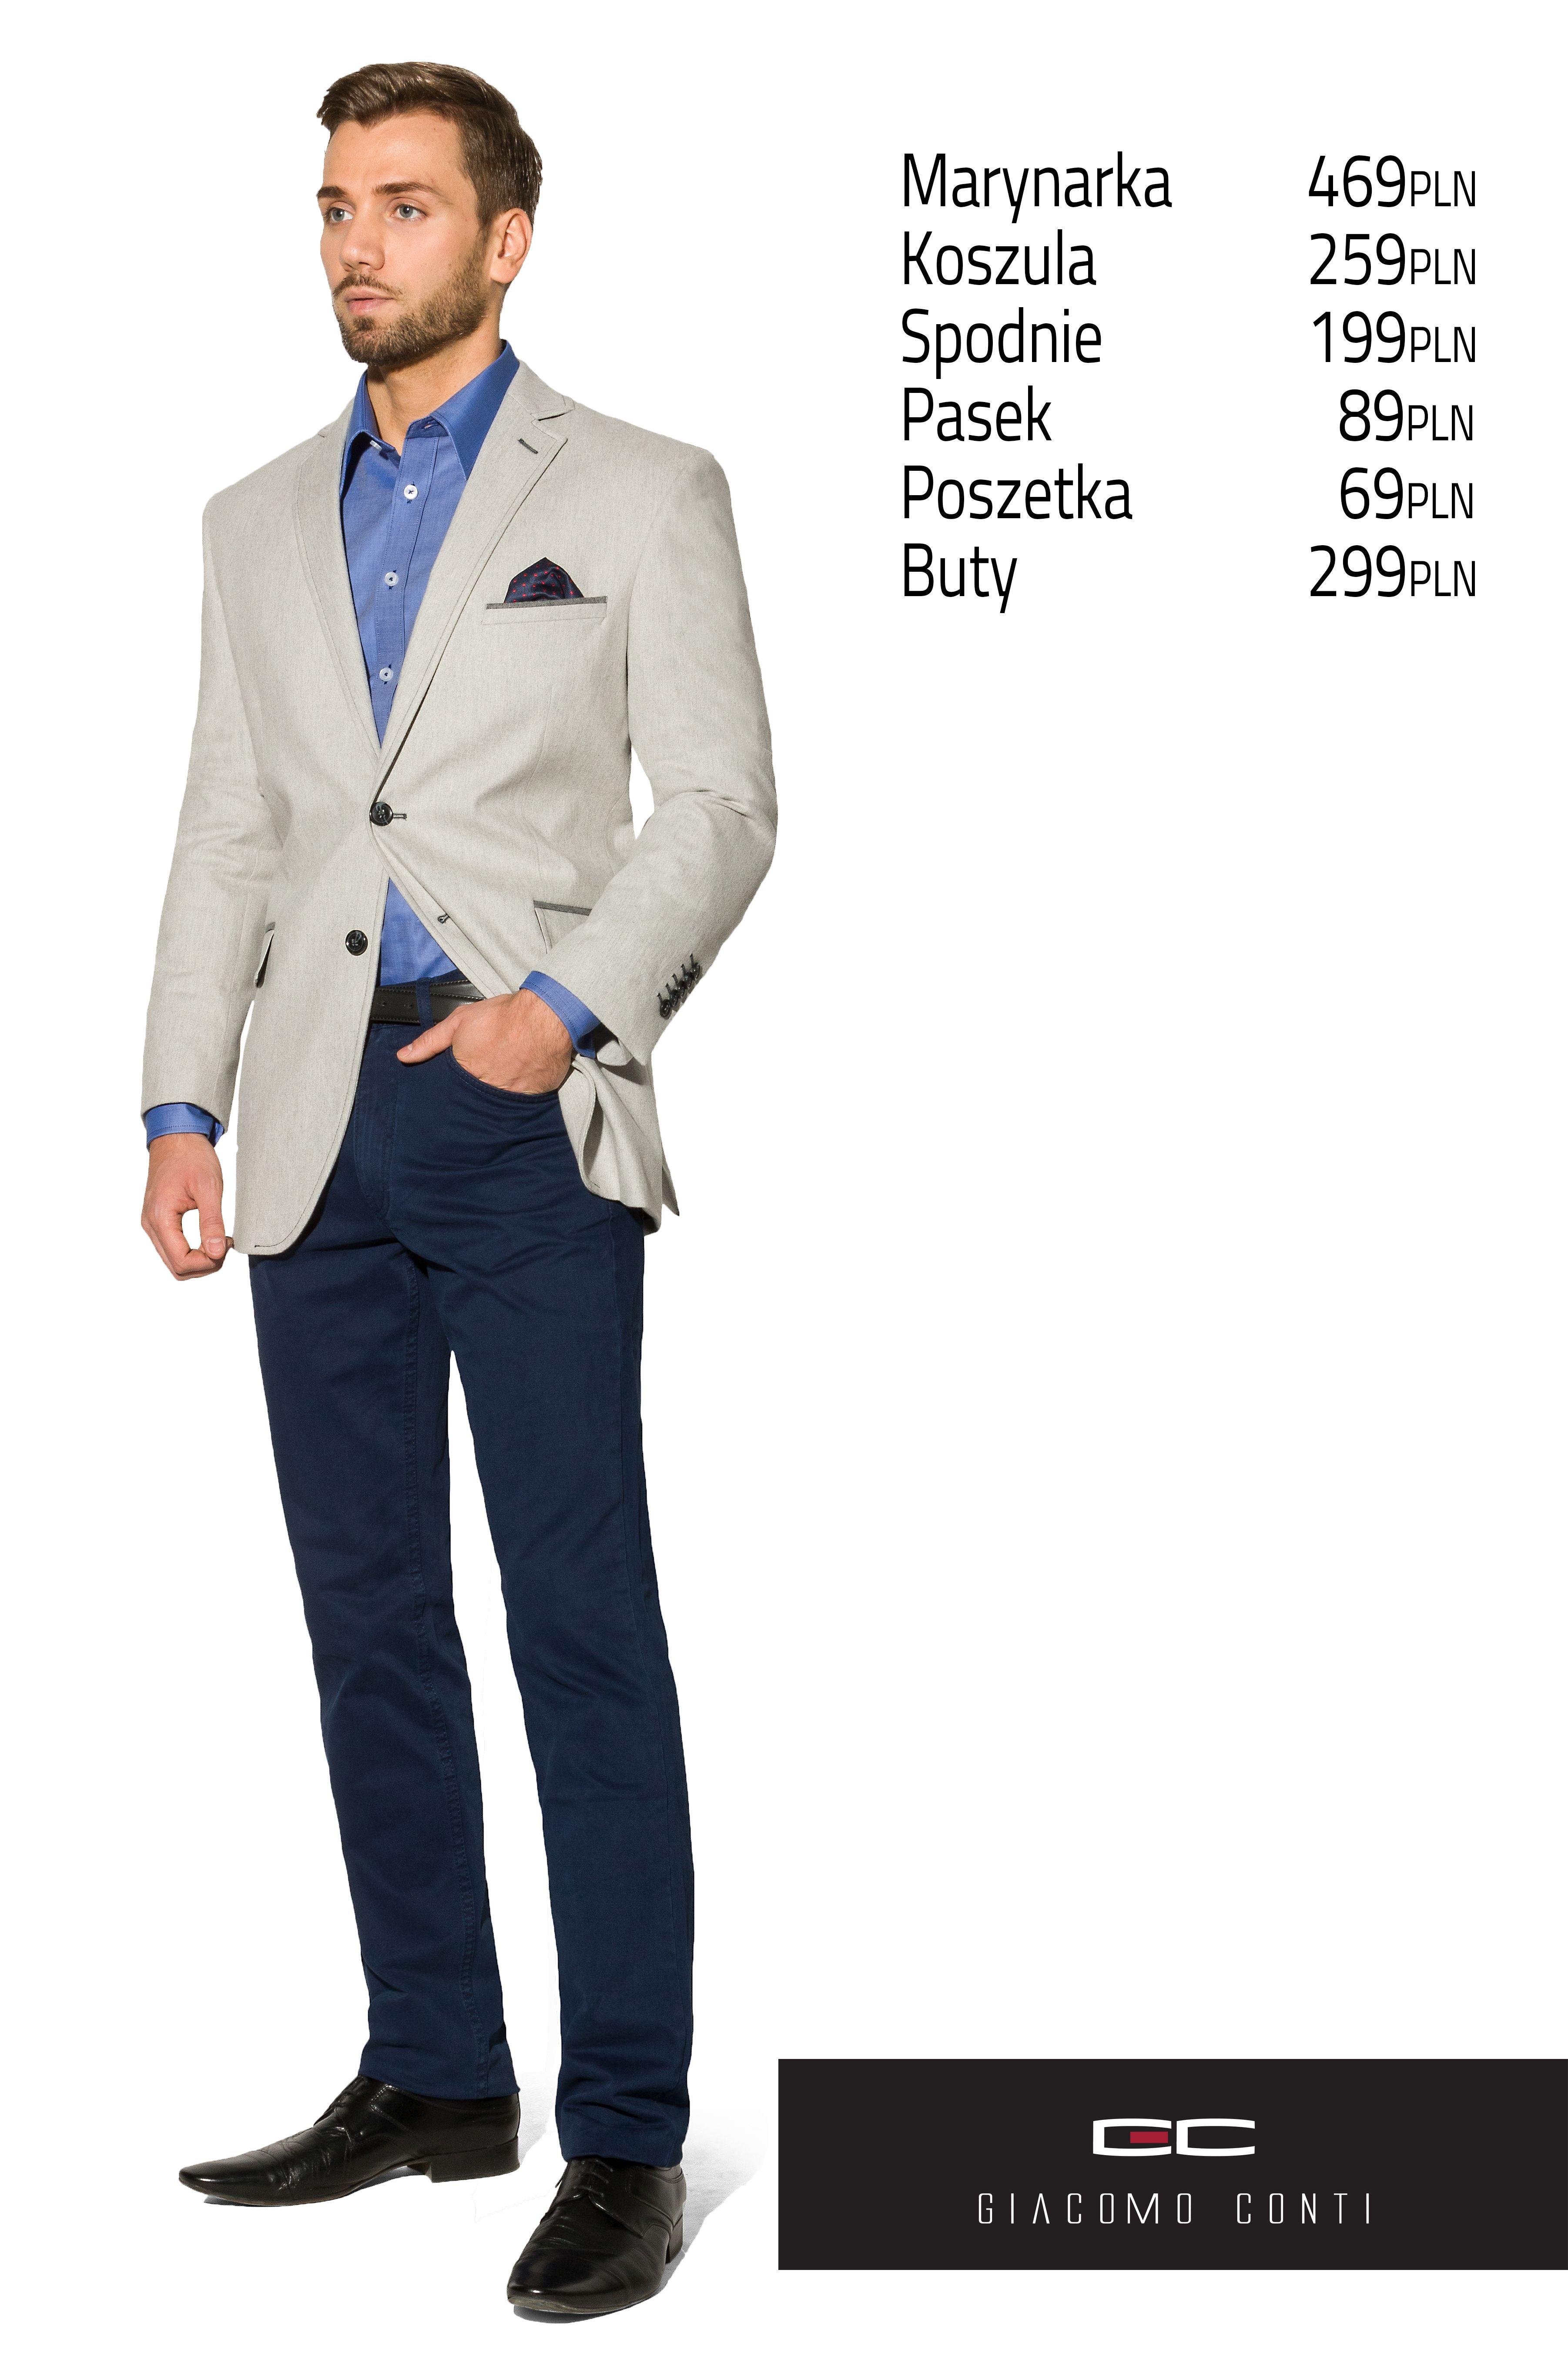 Stylizacja Giacomo Conti Ciemnoszara Marynarka Antonio 13 10sm Niebieska Koszula Antonio 13 10sm Granatowe Suit Jacket Jackets Single Breasted Suit Jacket